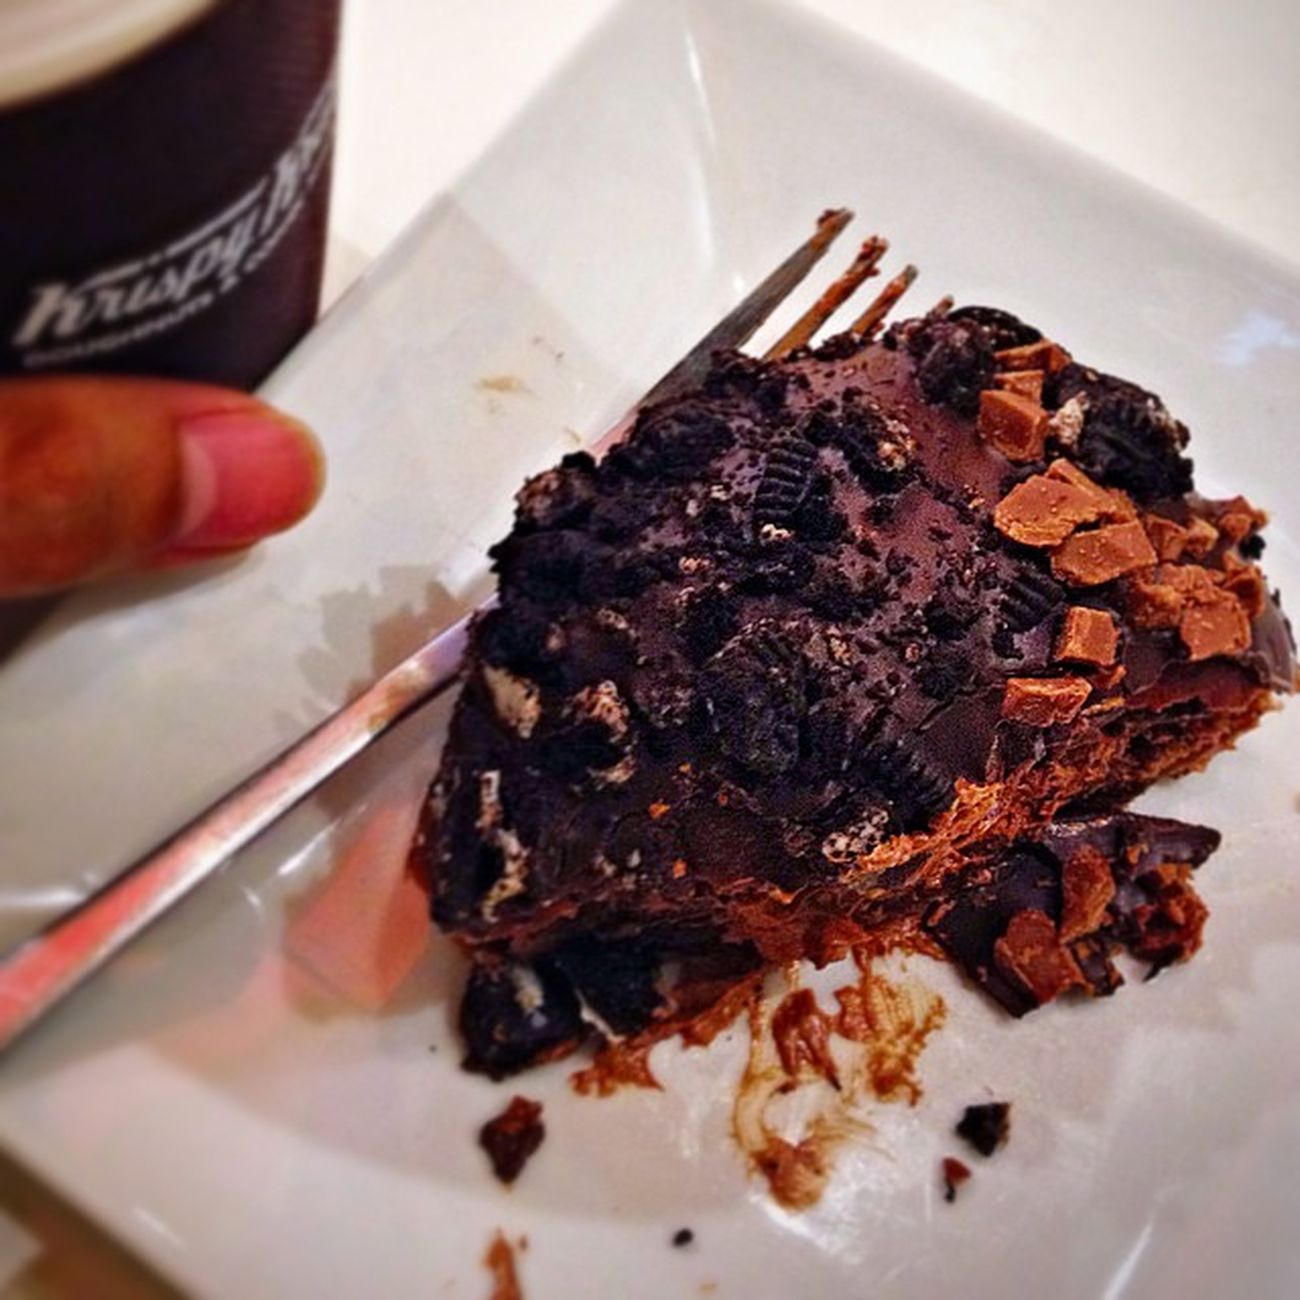 Krispykremeph Chocolatecreations taste of heaven!! Mud pie and coffee!!